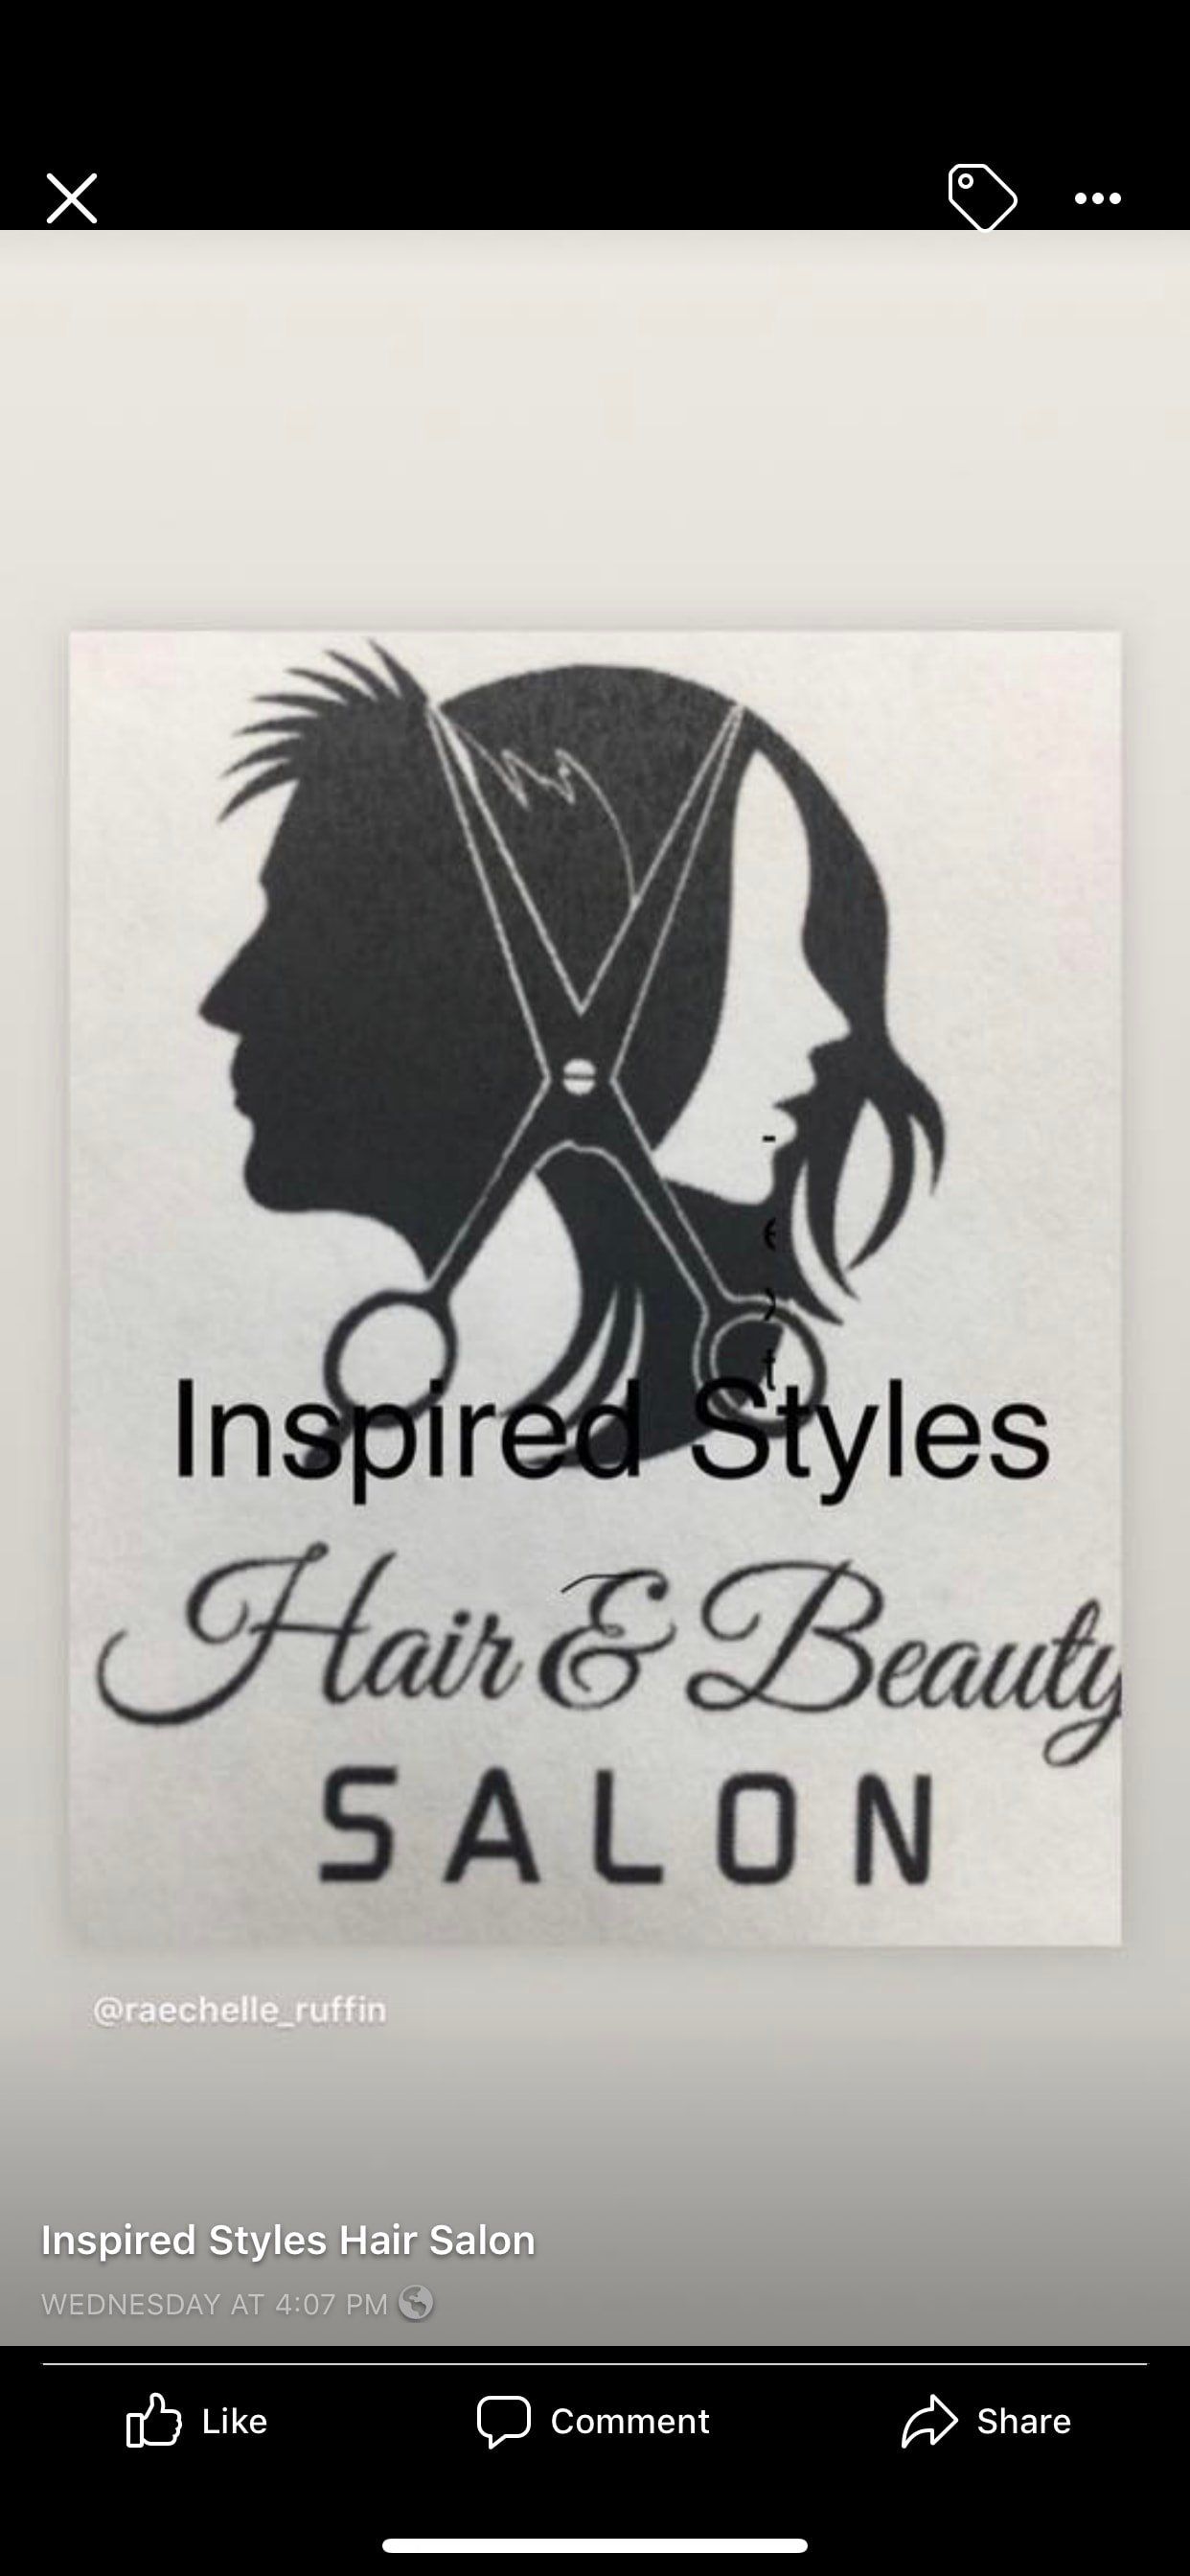 Inspired Styles Hair Salon